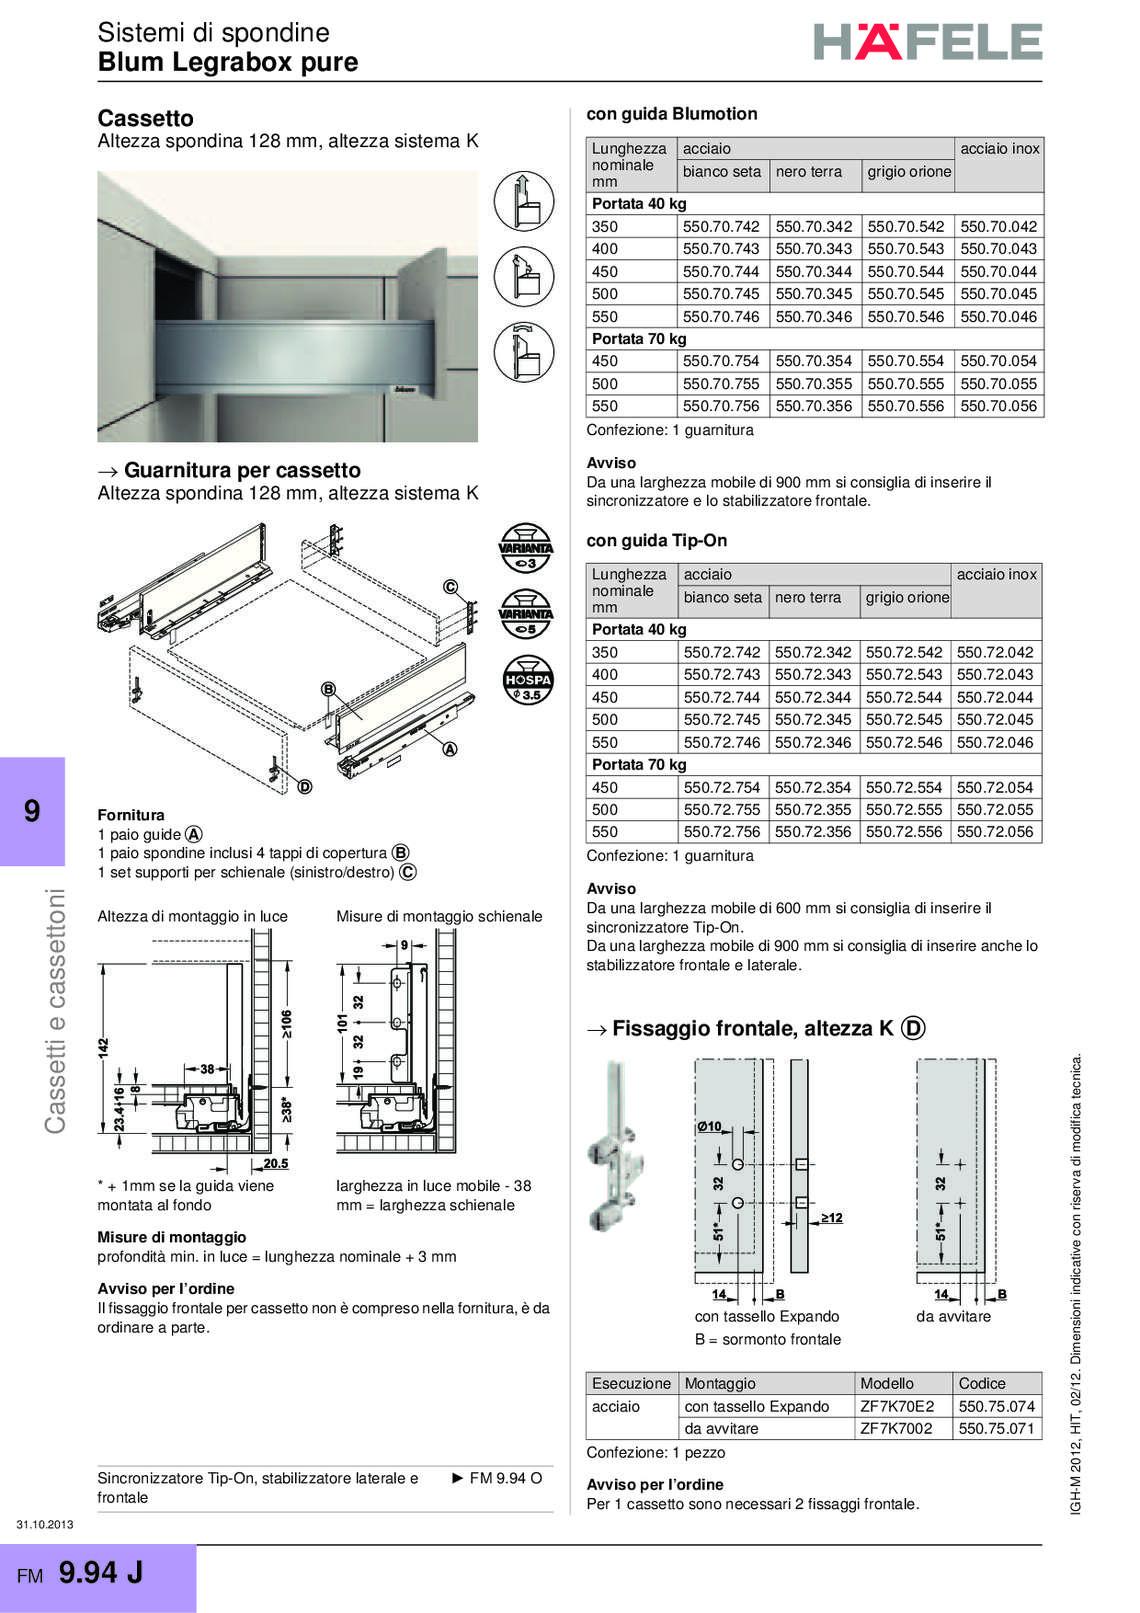 hafele-spondine-e-guide-per-mobili_40_127.jpg